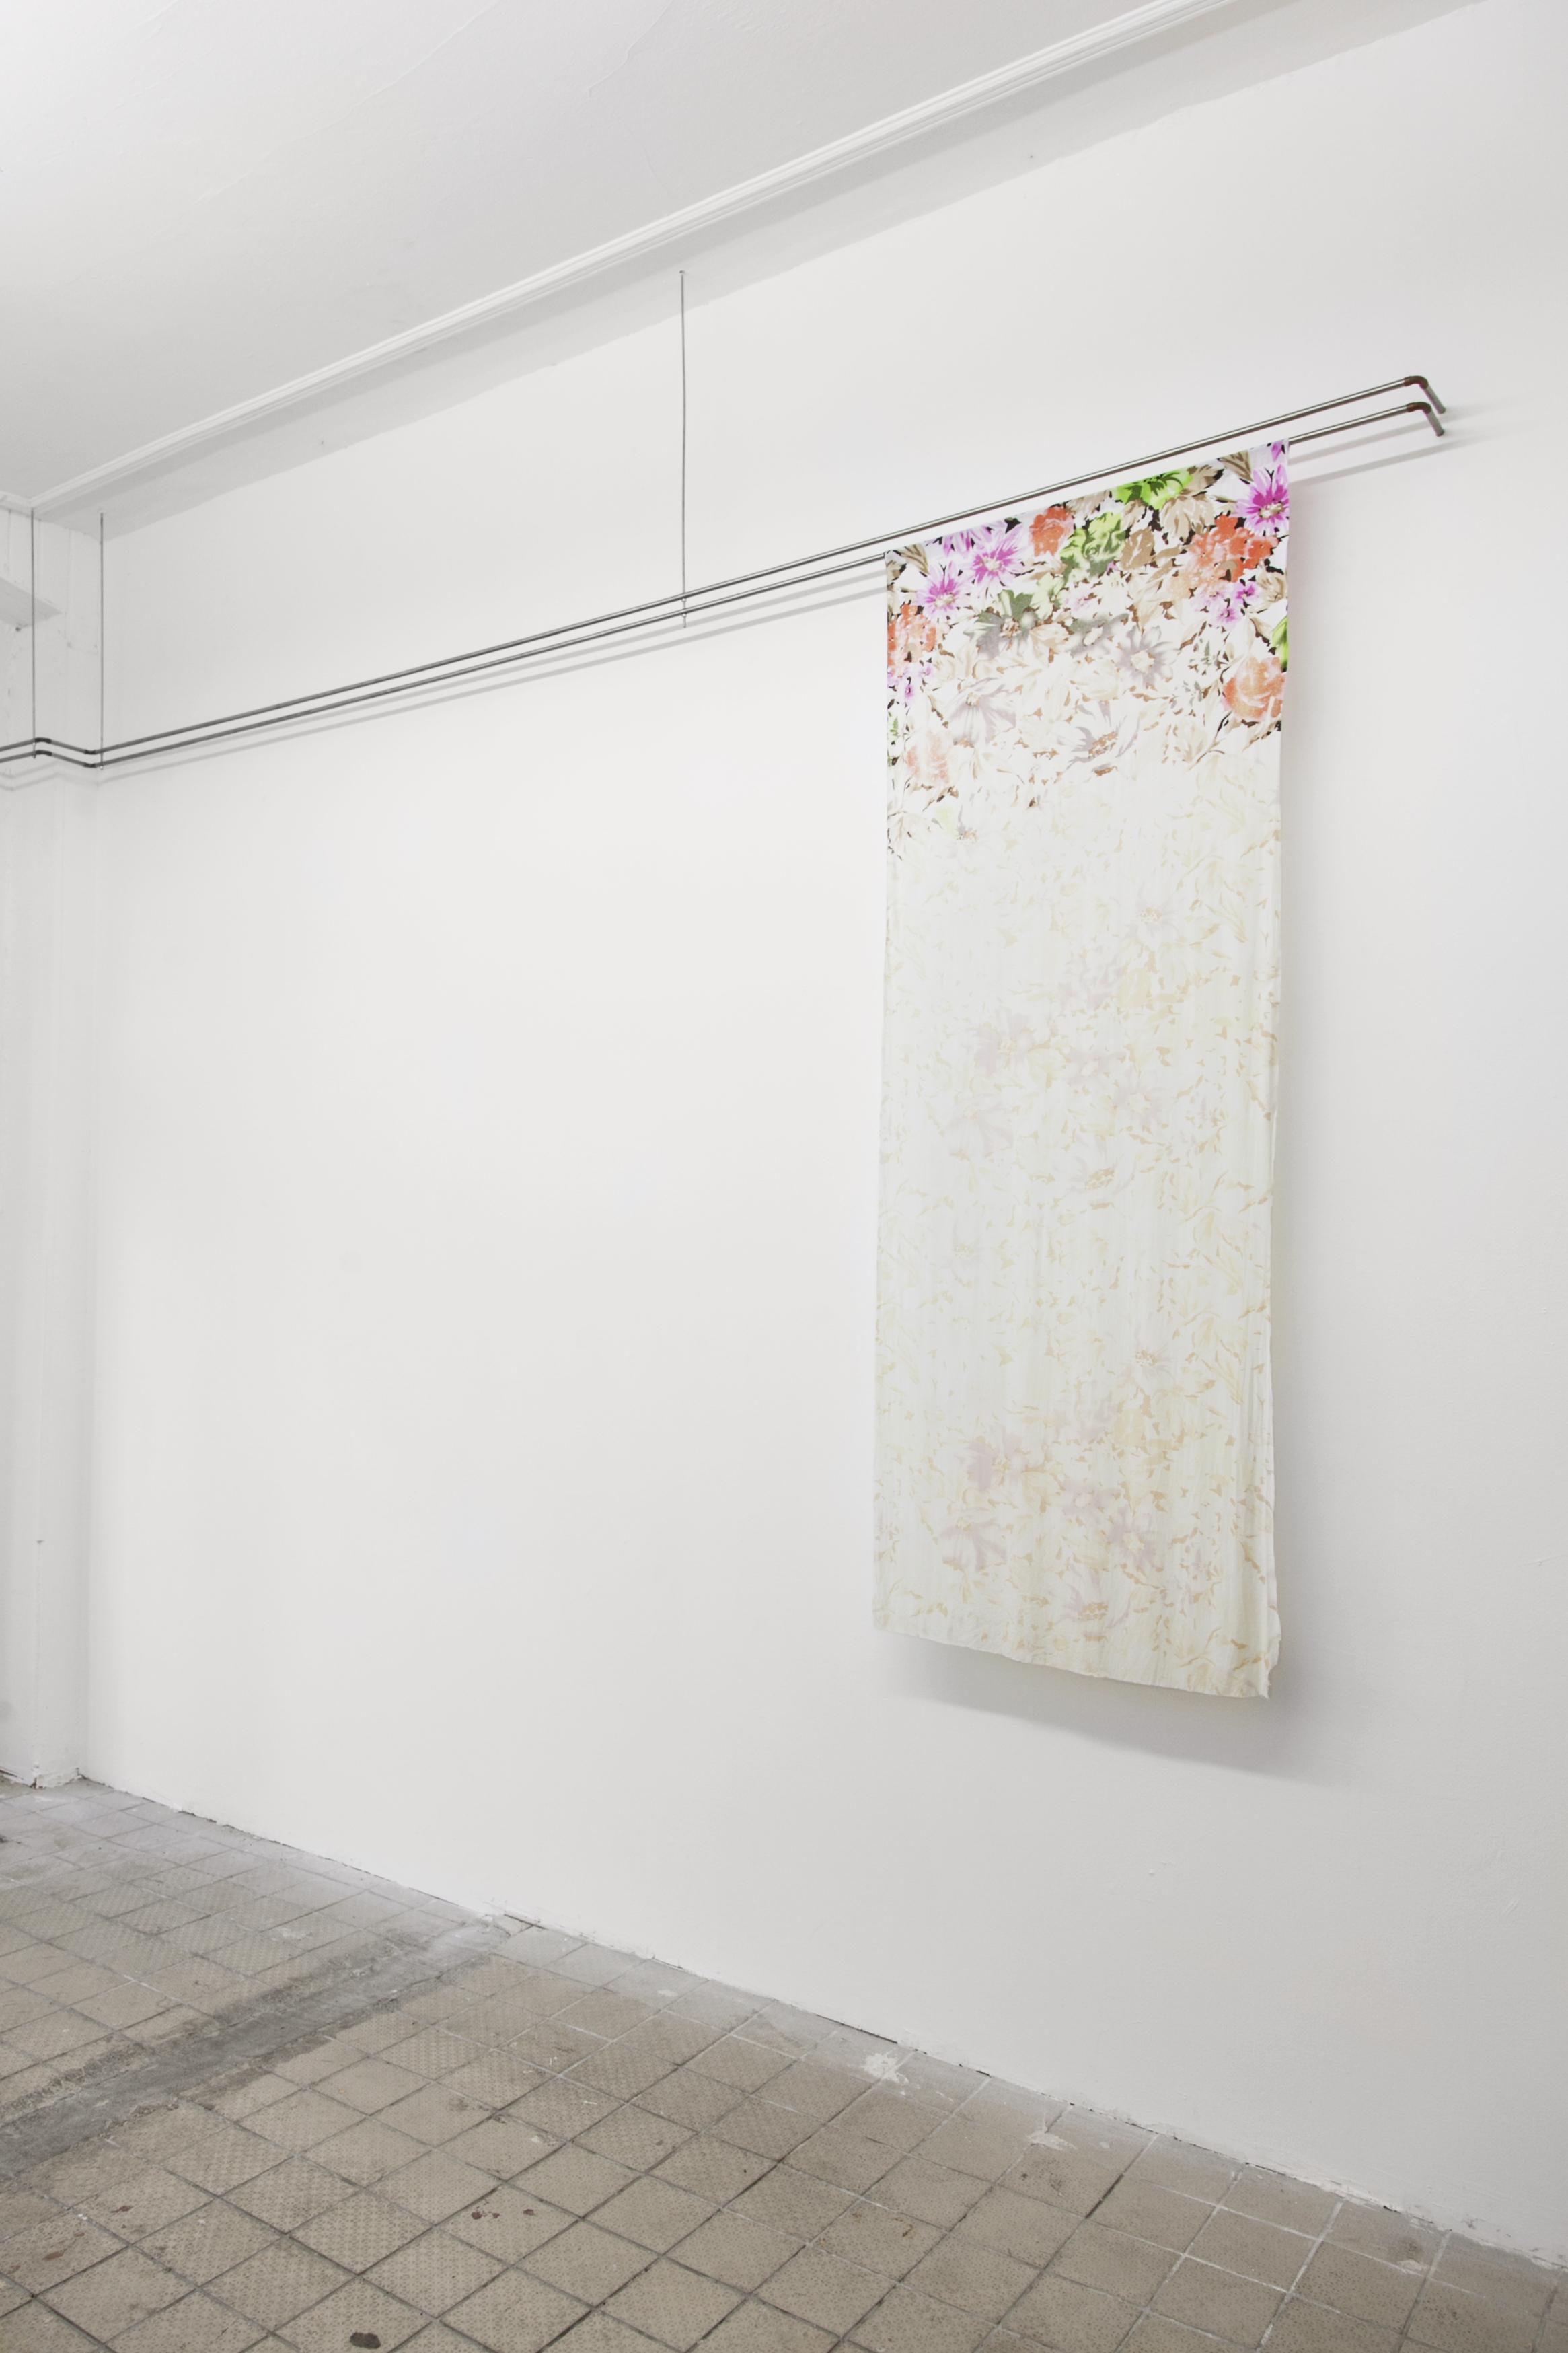 Mia Goyette, Sunscreen (Wildflowers), 2014